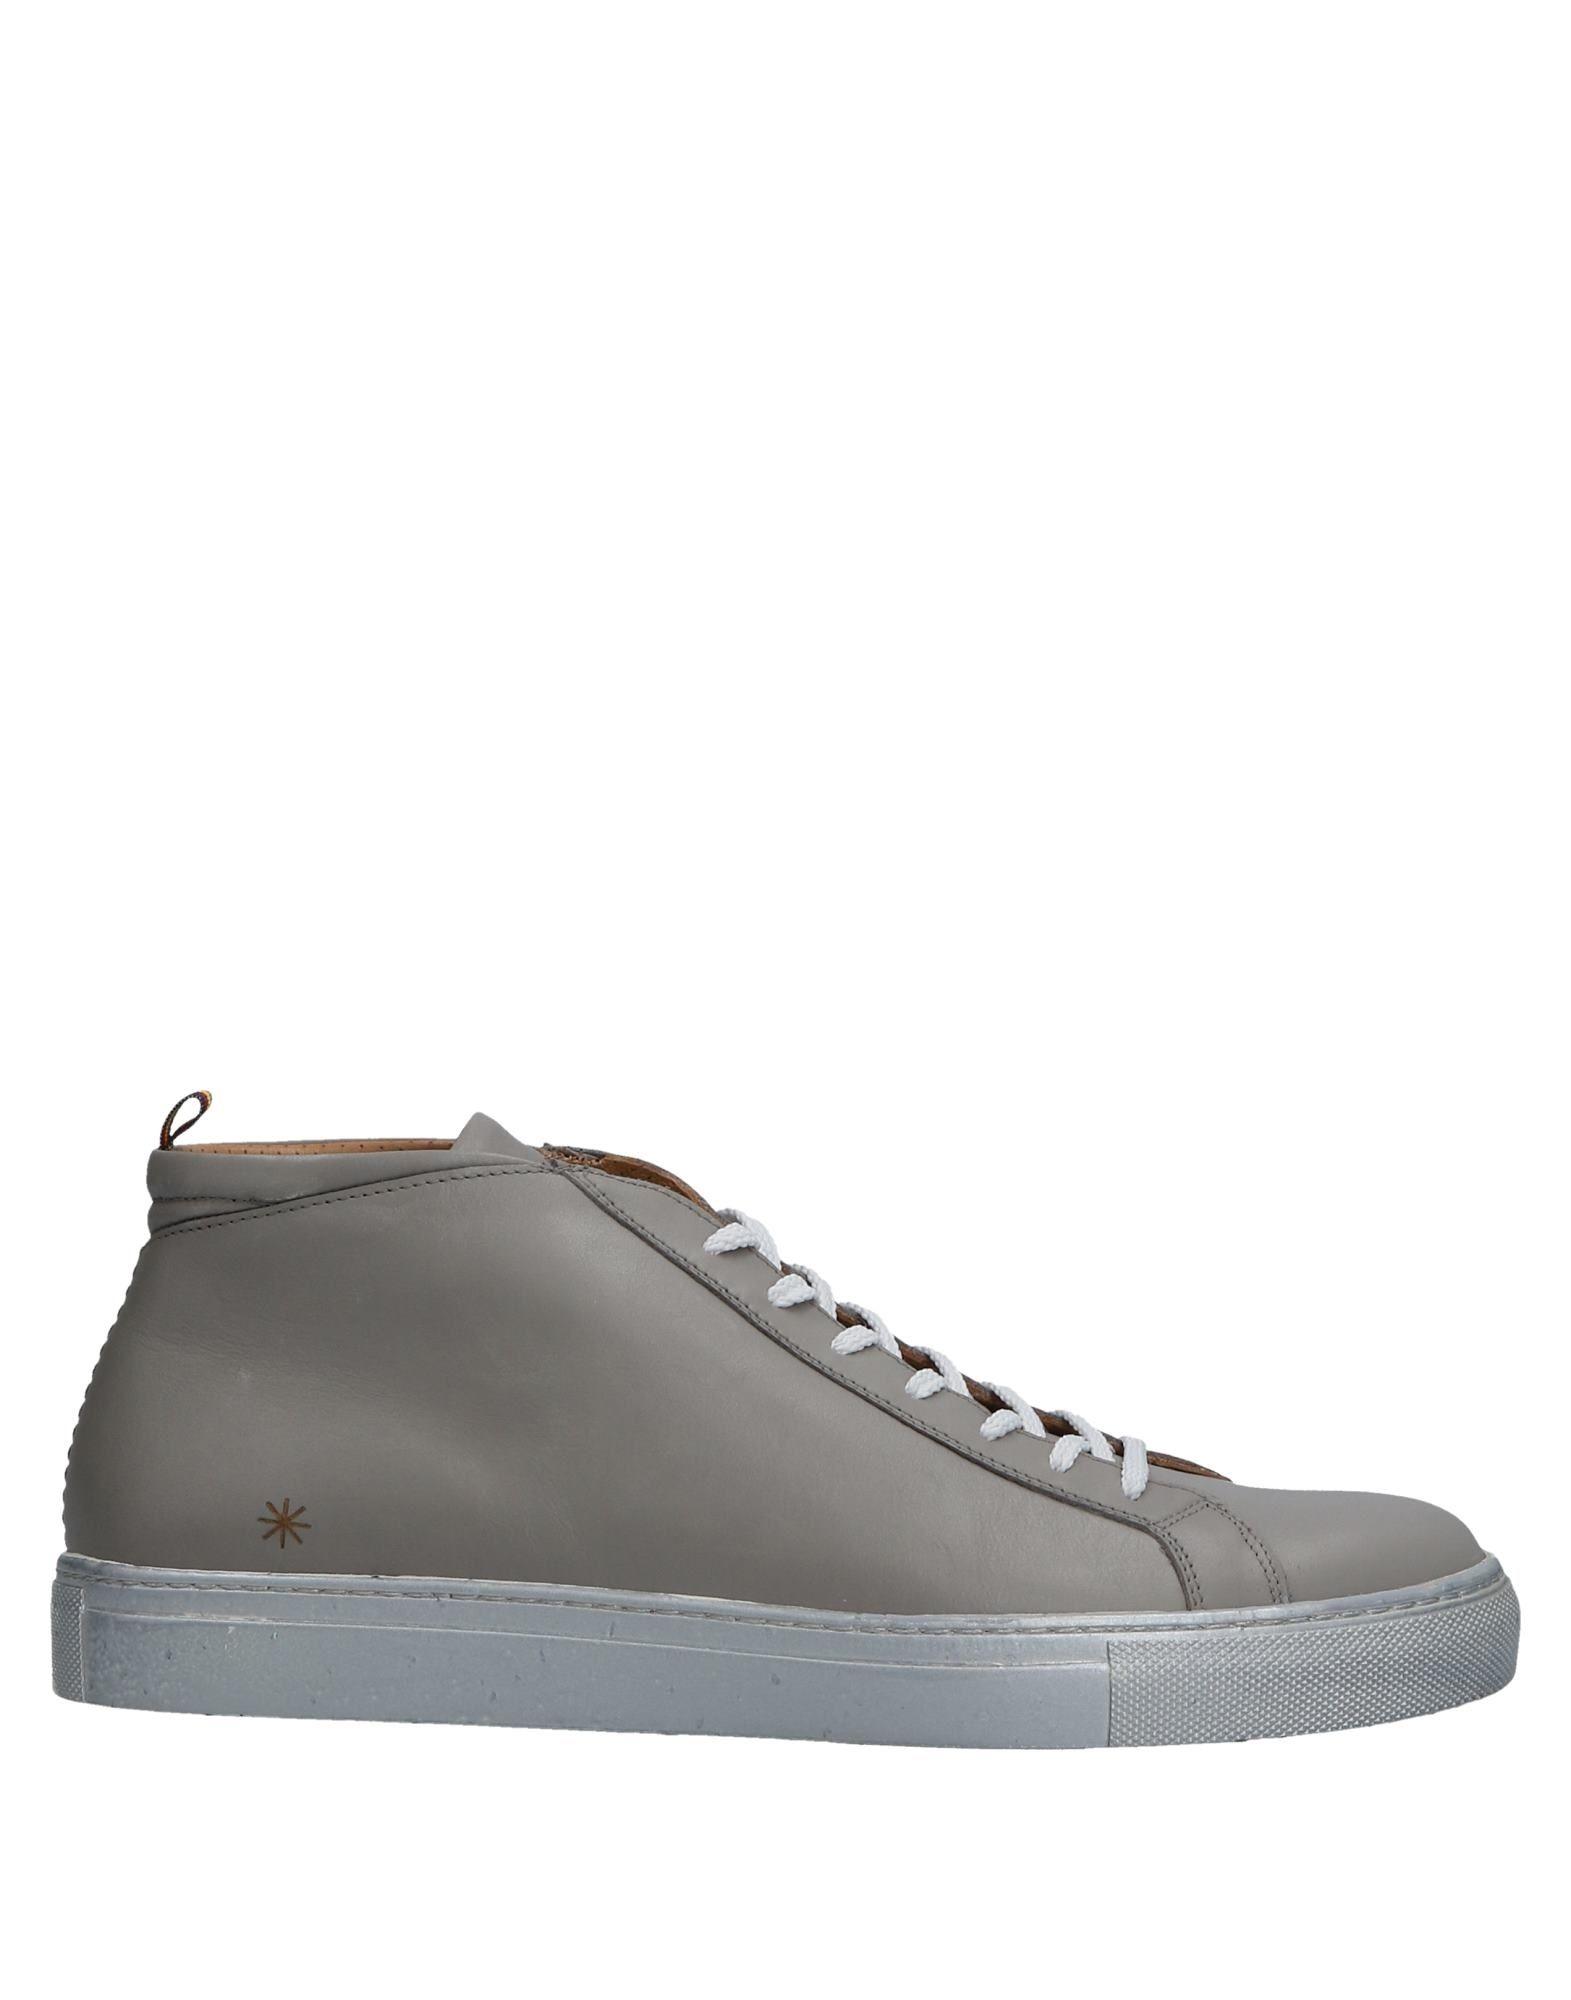 Sneakers Manuel Ritz Uomo - 11531165JL